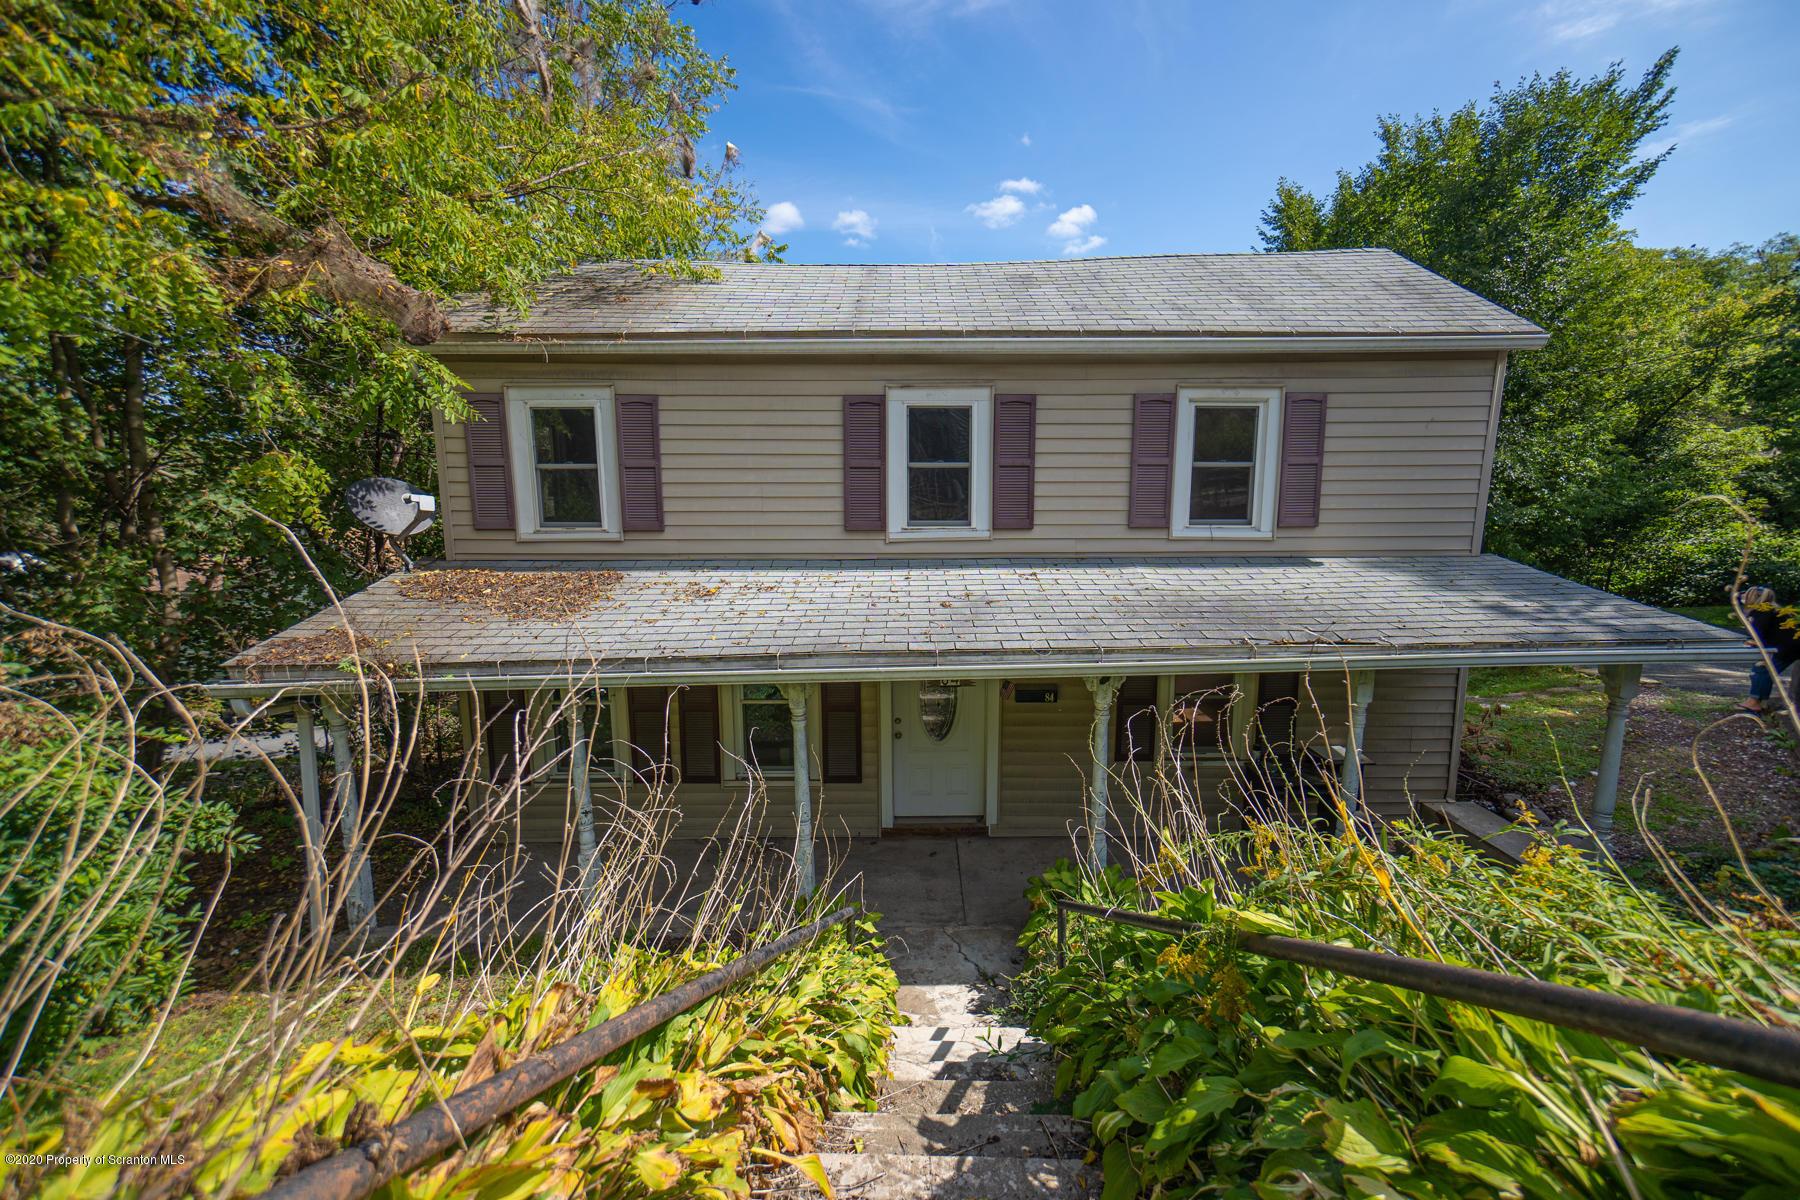 84 Euclid Ave, Susquehanna, Pennsylvania 18847, 2 Bedrooms Bedrooms, 5 Rooms Rooms,1 BathroomBathrooms,Single Family,For Sale,Euclid,20-3802